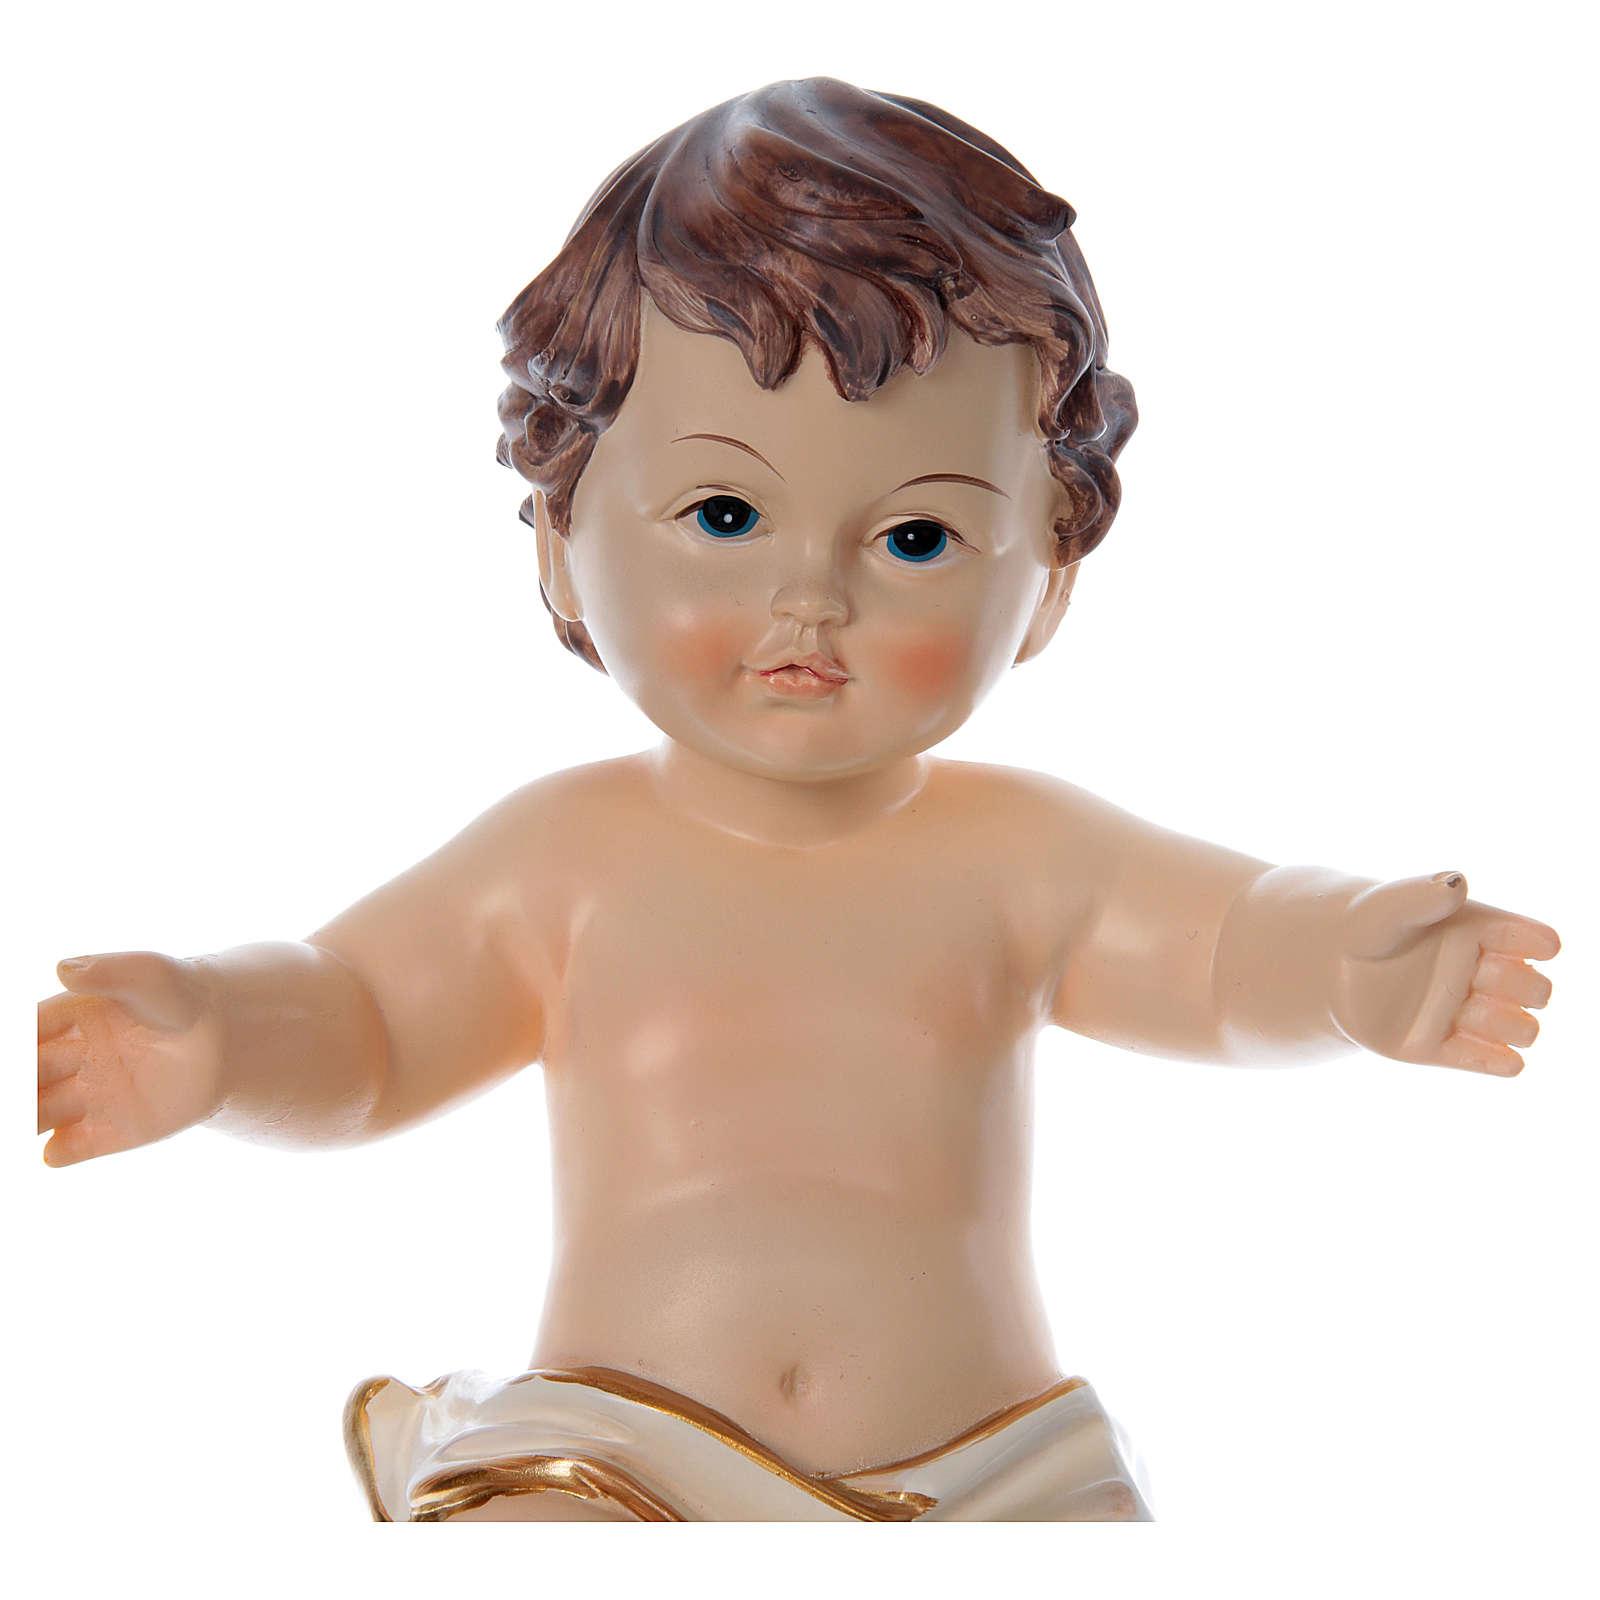 Menino Jesus braços abertos altura real 20 cm resina 3